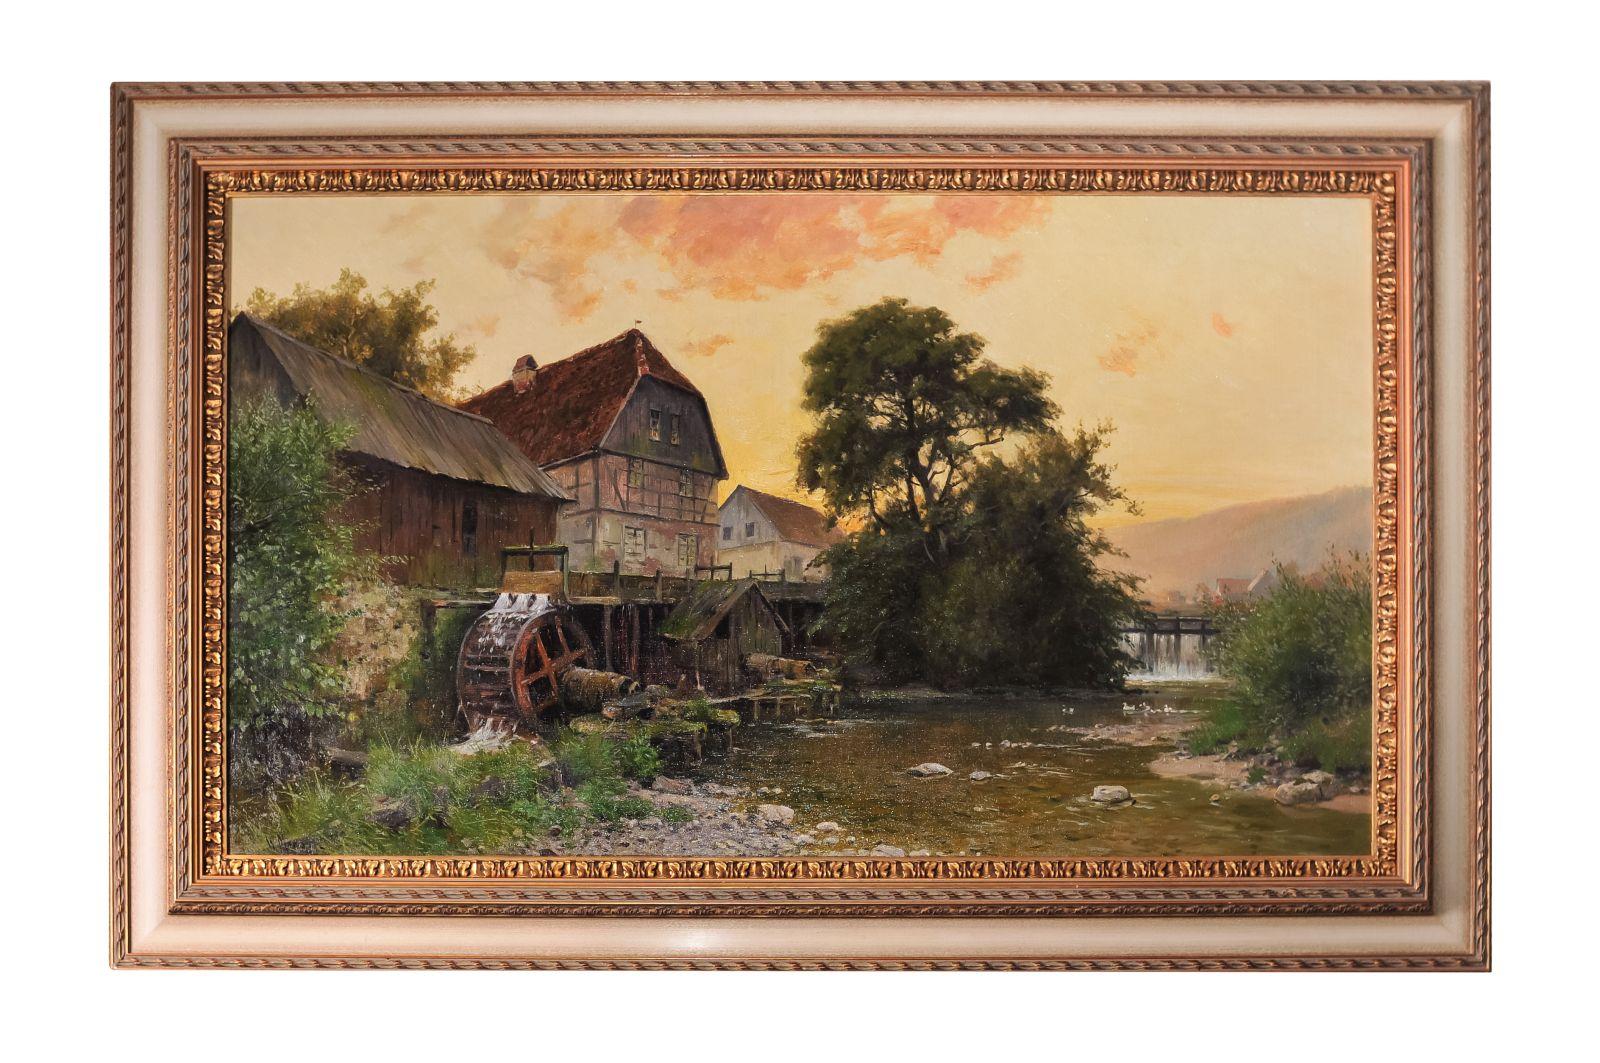 "#42 Moras Walter ""Watermill near Marburg"" Berlin 1925| Moras Walter  ""Wassermühle bei Marburg"" Berlin 1925 Image"